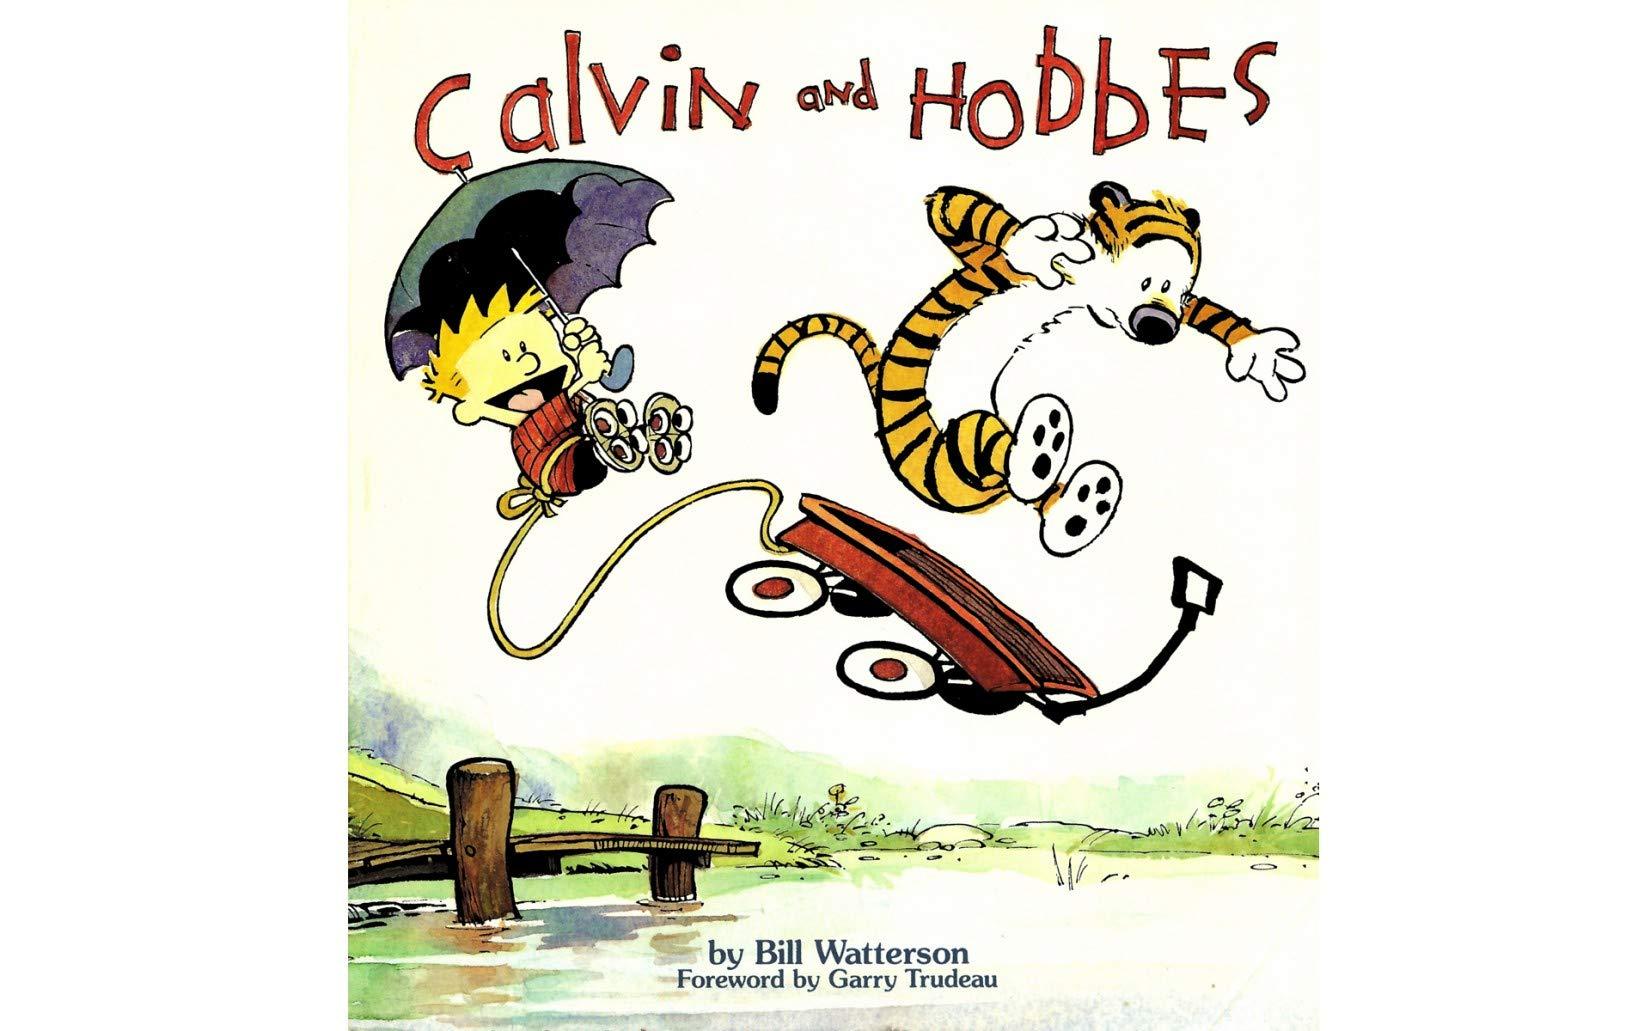 Calvin and Hobbes: Vol 1 Great Advanture Cartoon Comics Books For Kids, Boys , Girls , Fans , Adults